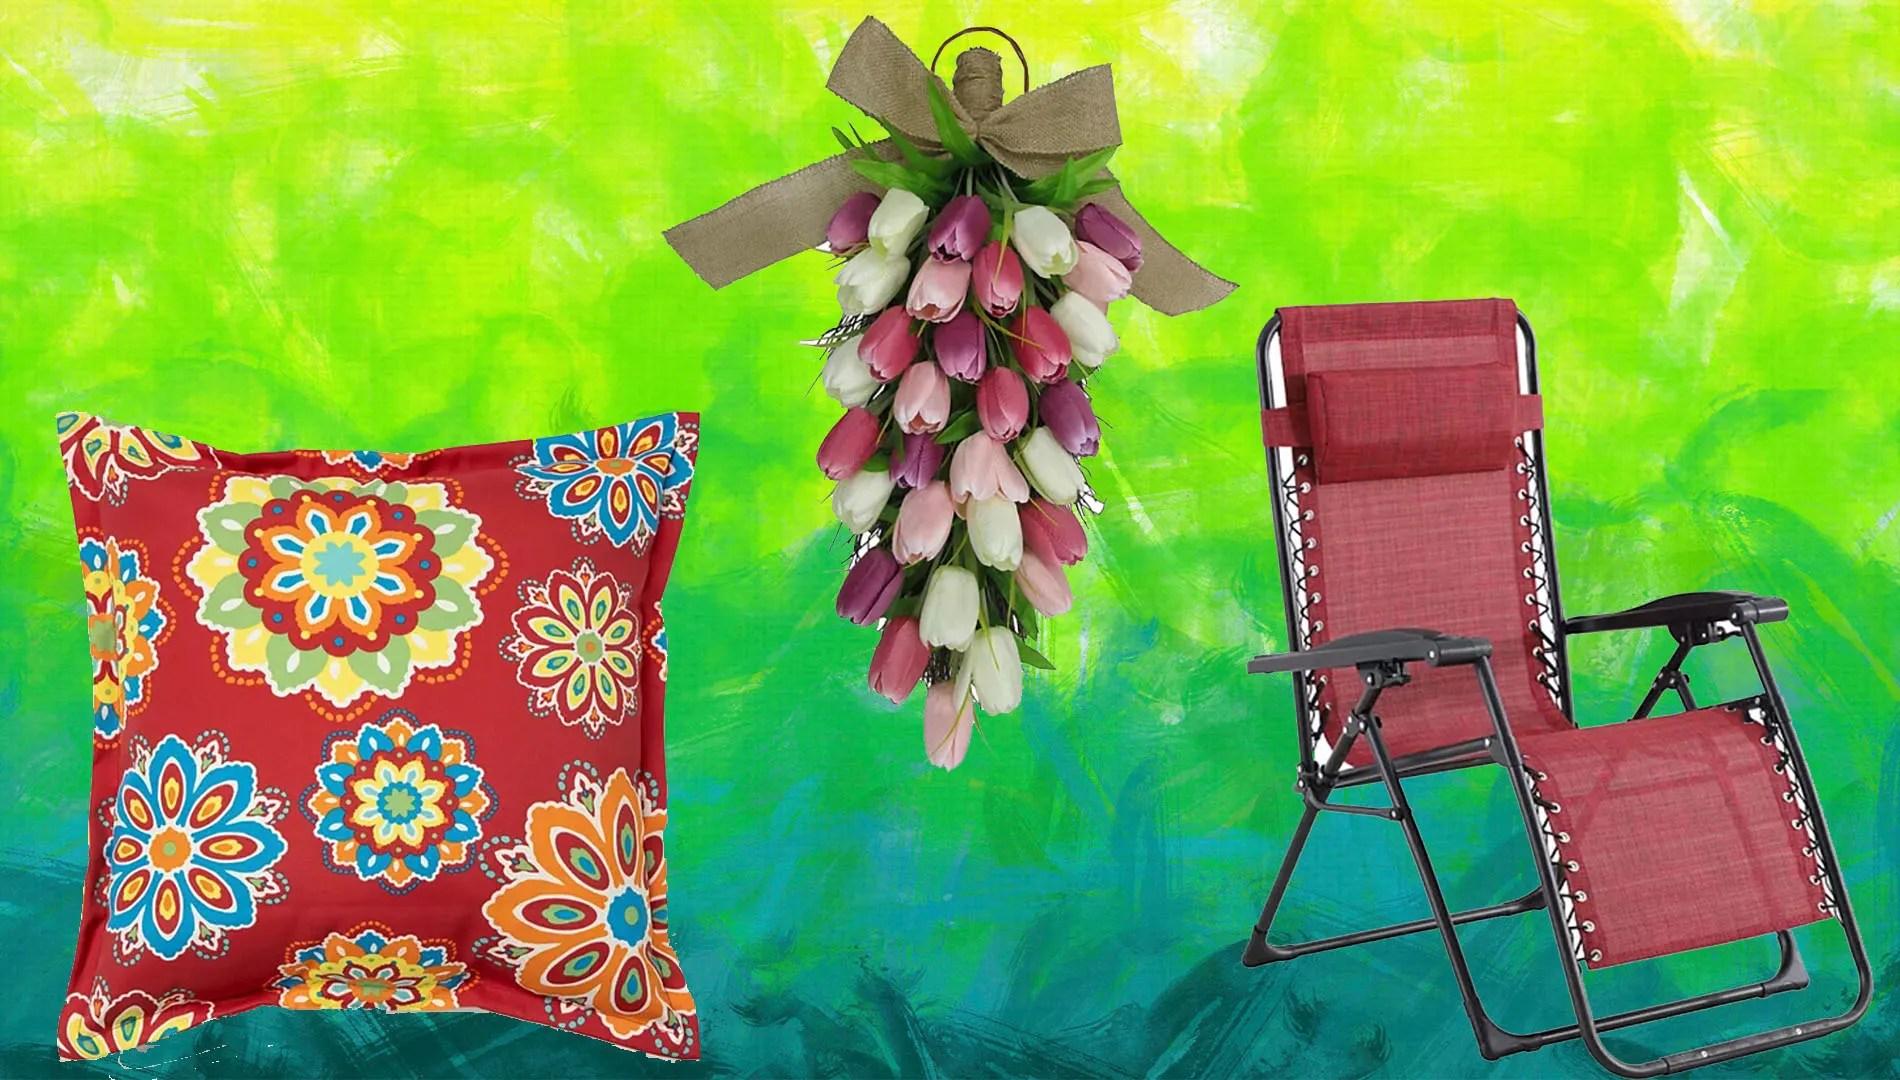 huge home sale on patio furniture